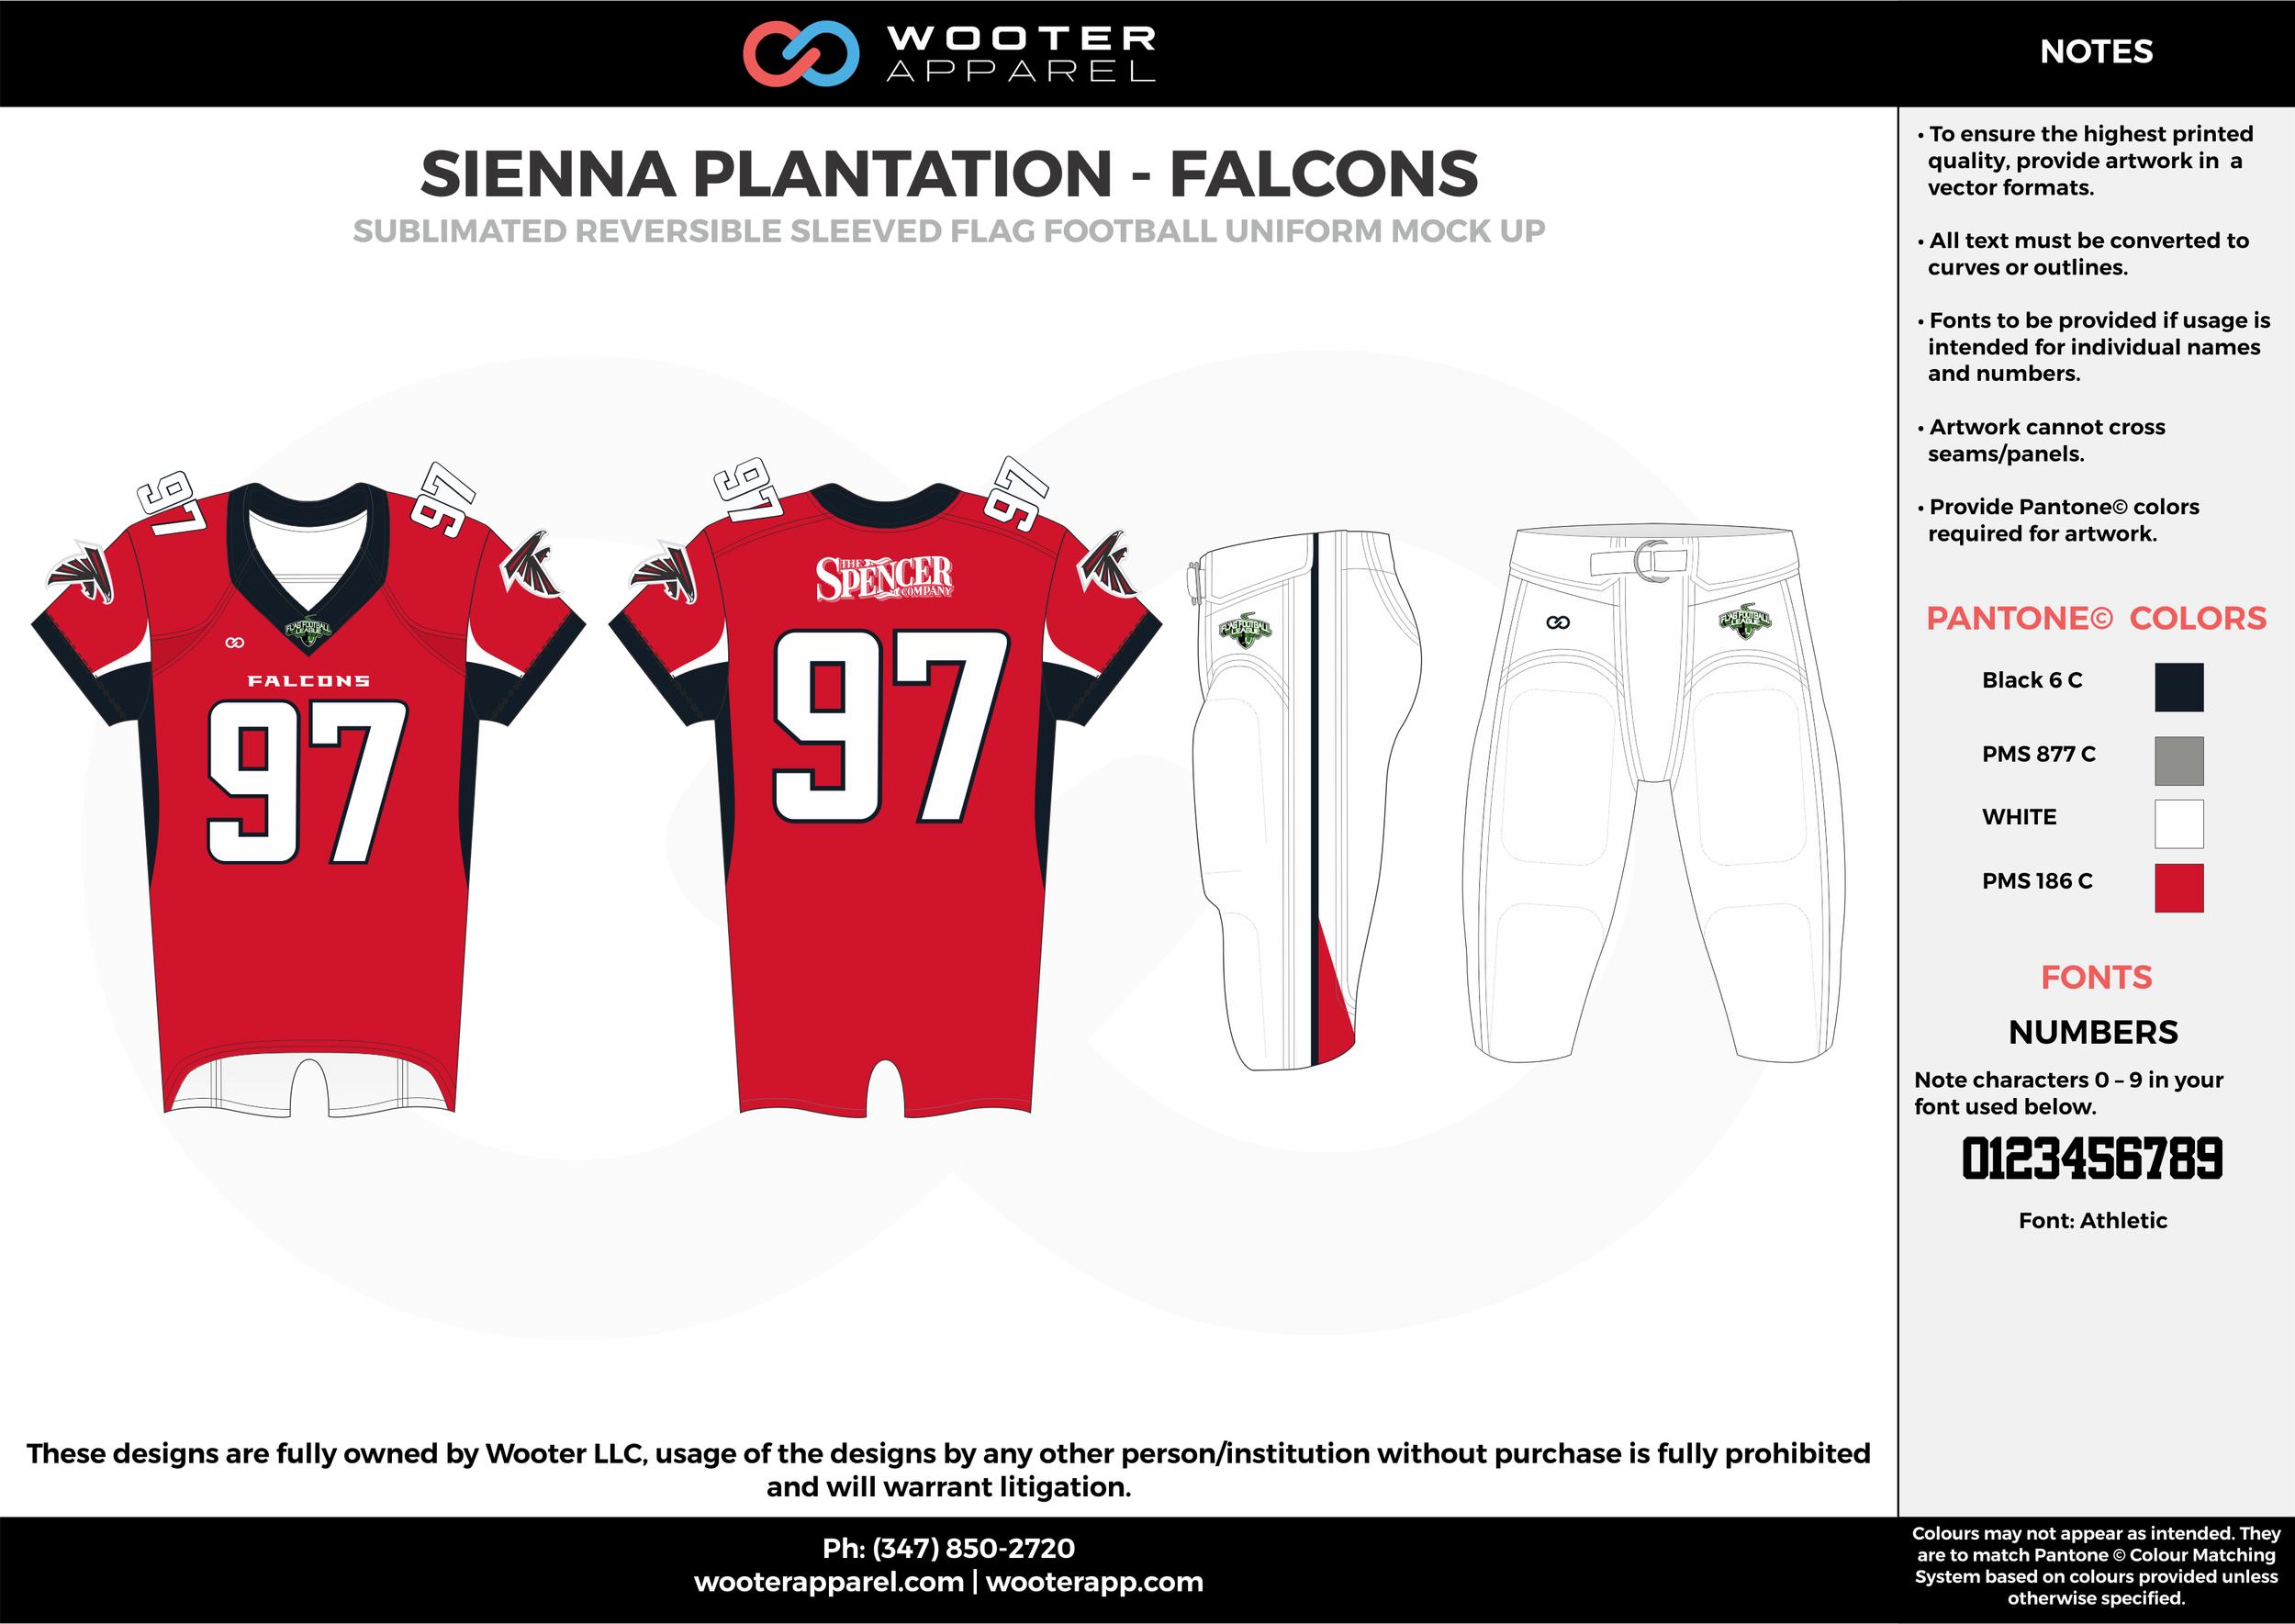 SIENNA PLANTATION - FALCONS red white gray black Football Uniform, Jersey, Pants, Integraded